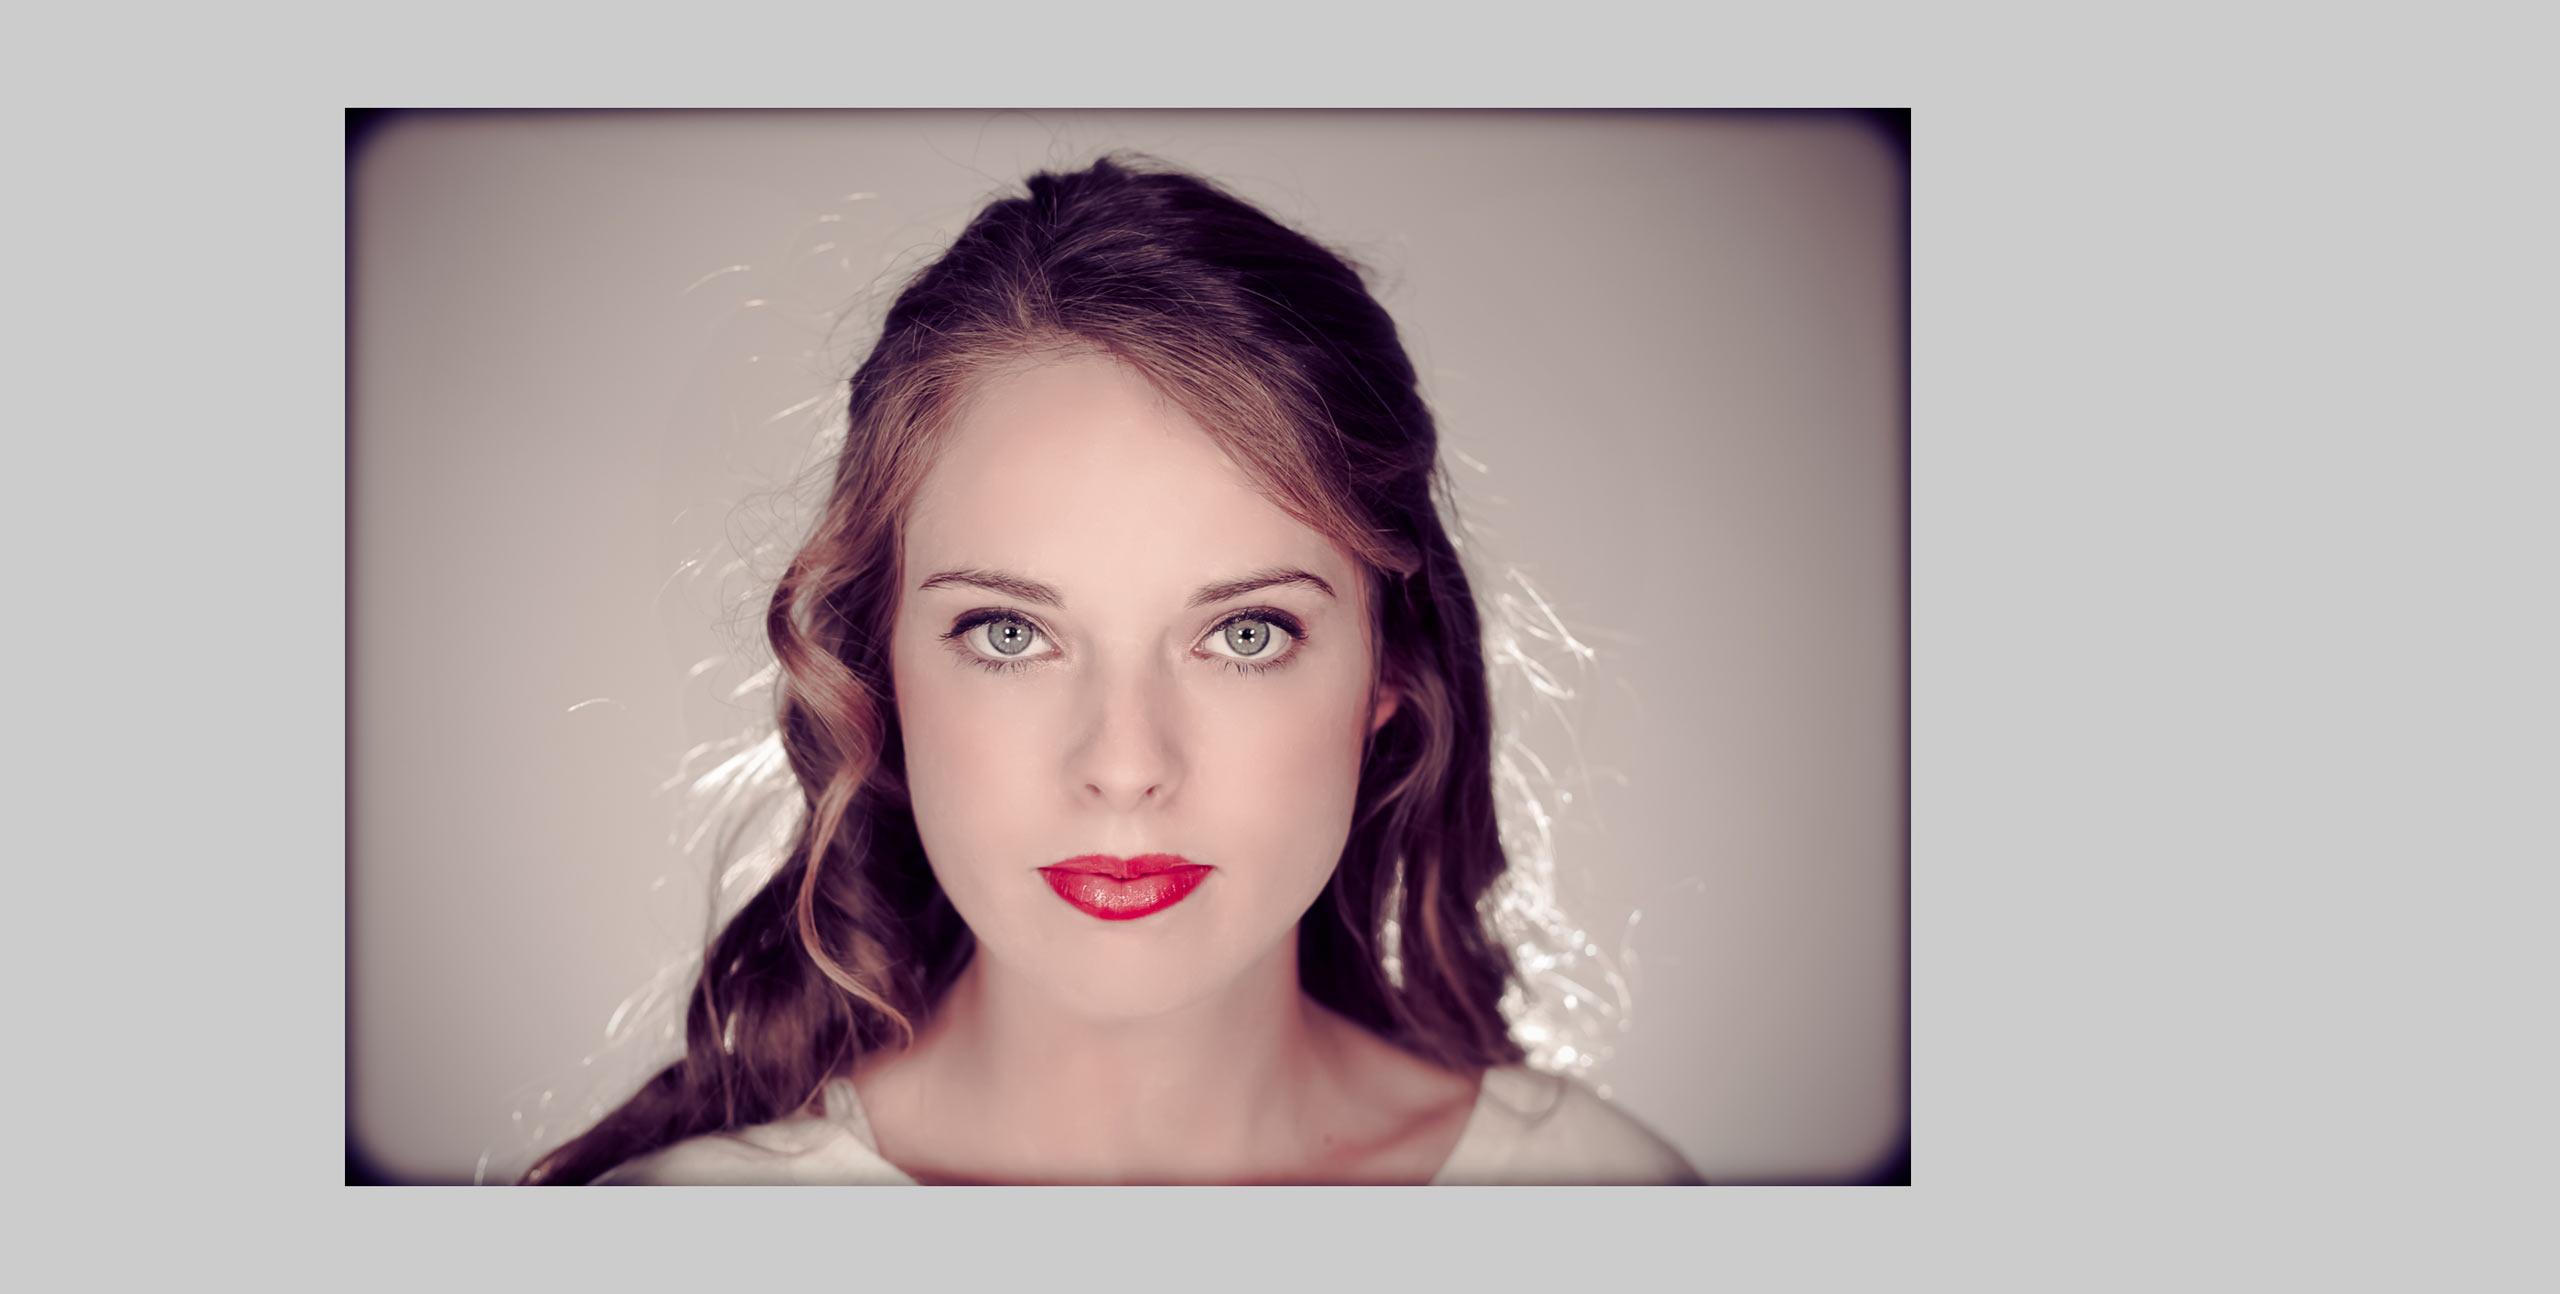 chicago senior portrait photographer claire spreads (11)